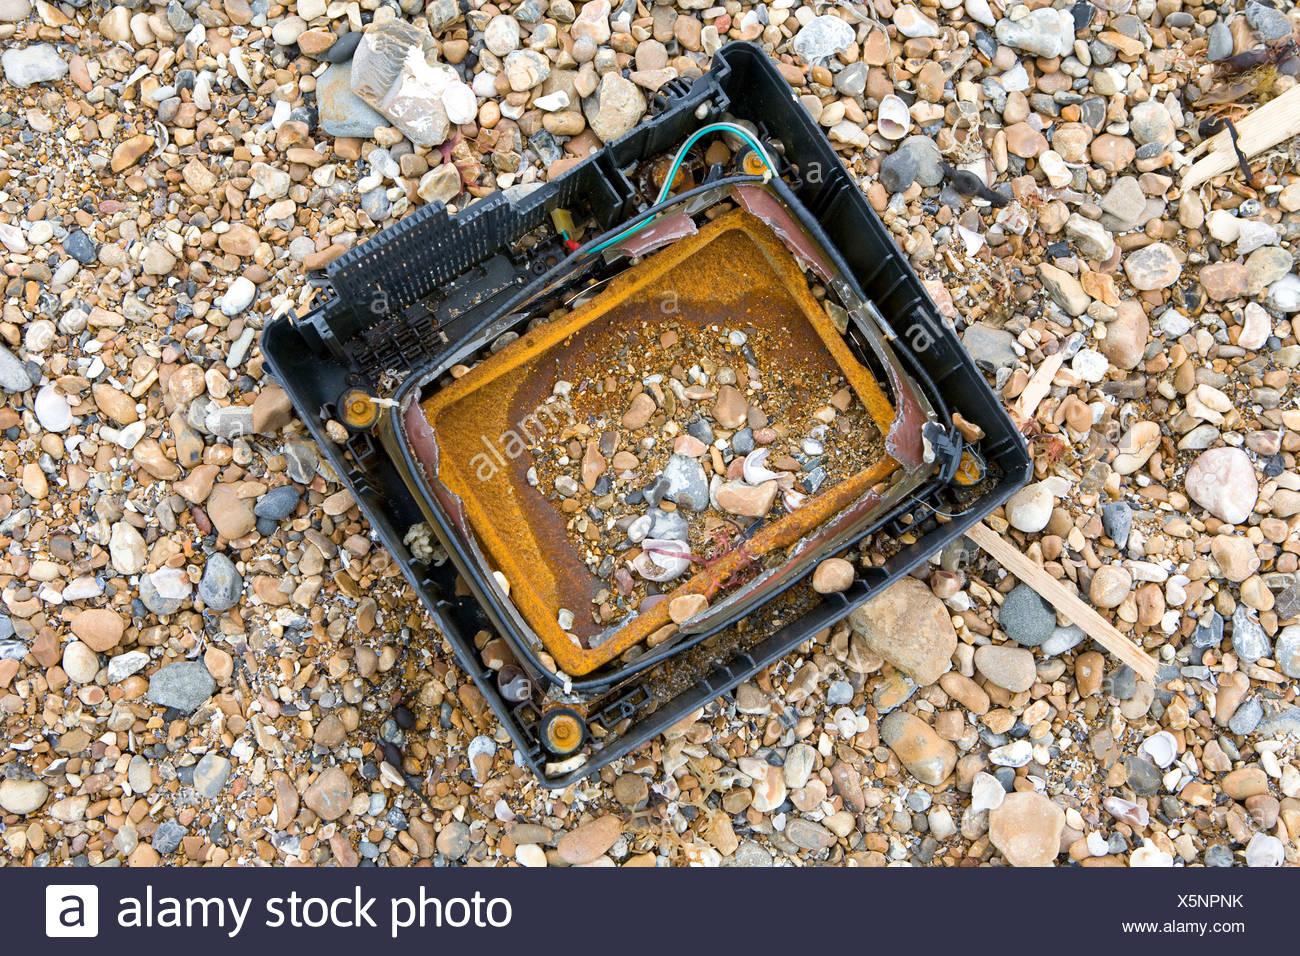 TV on pebble beach - Stock Image